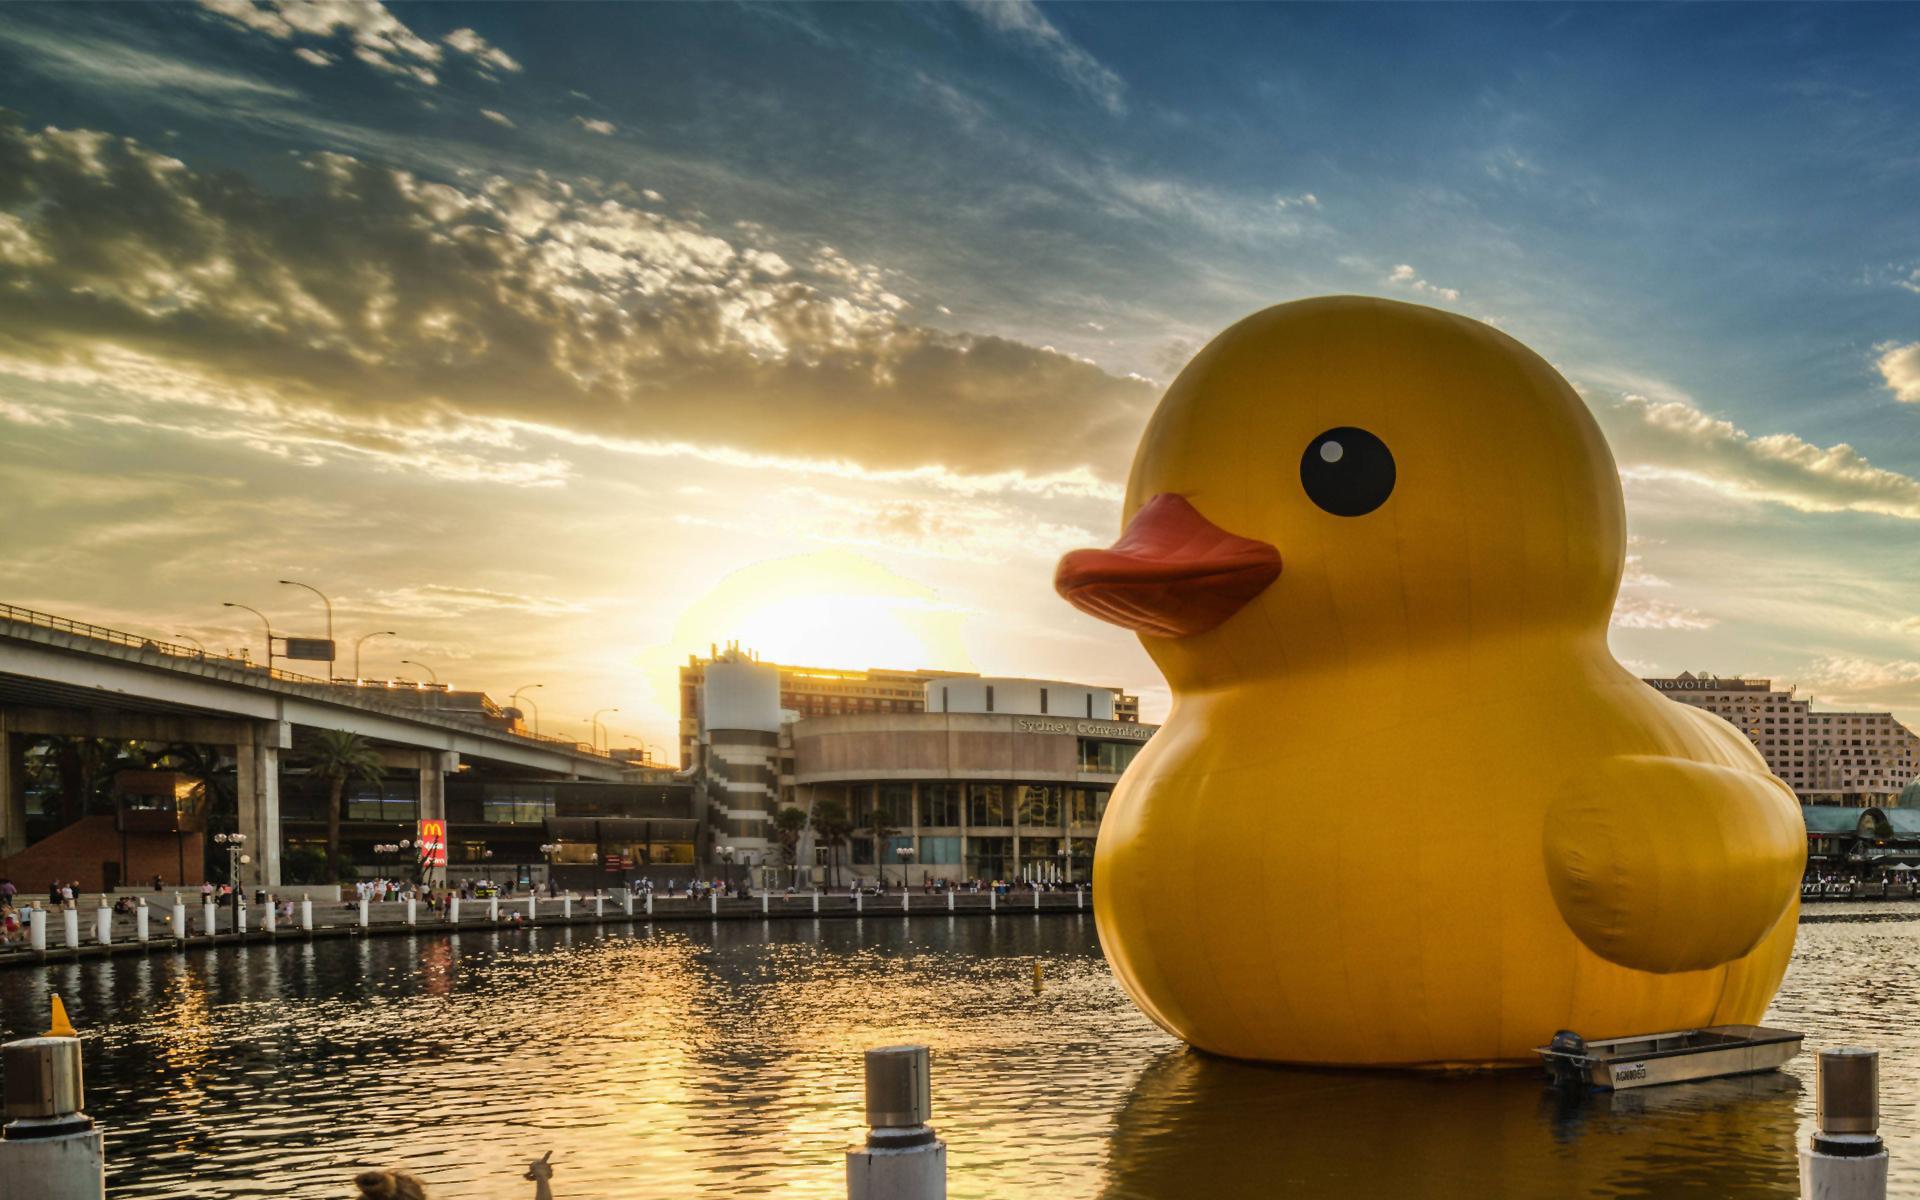 Rubber duck city